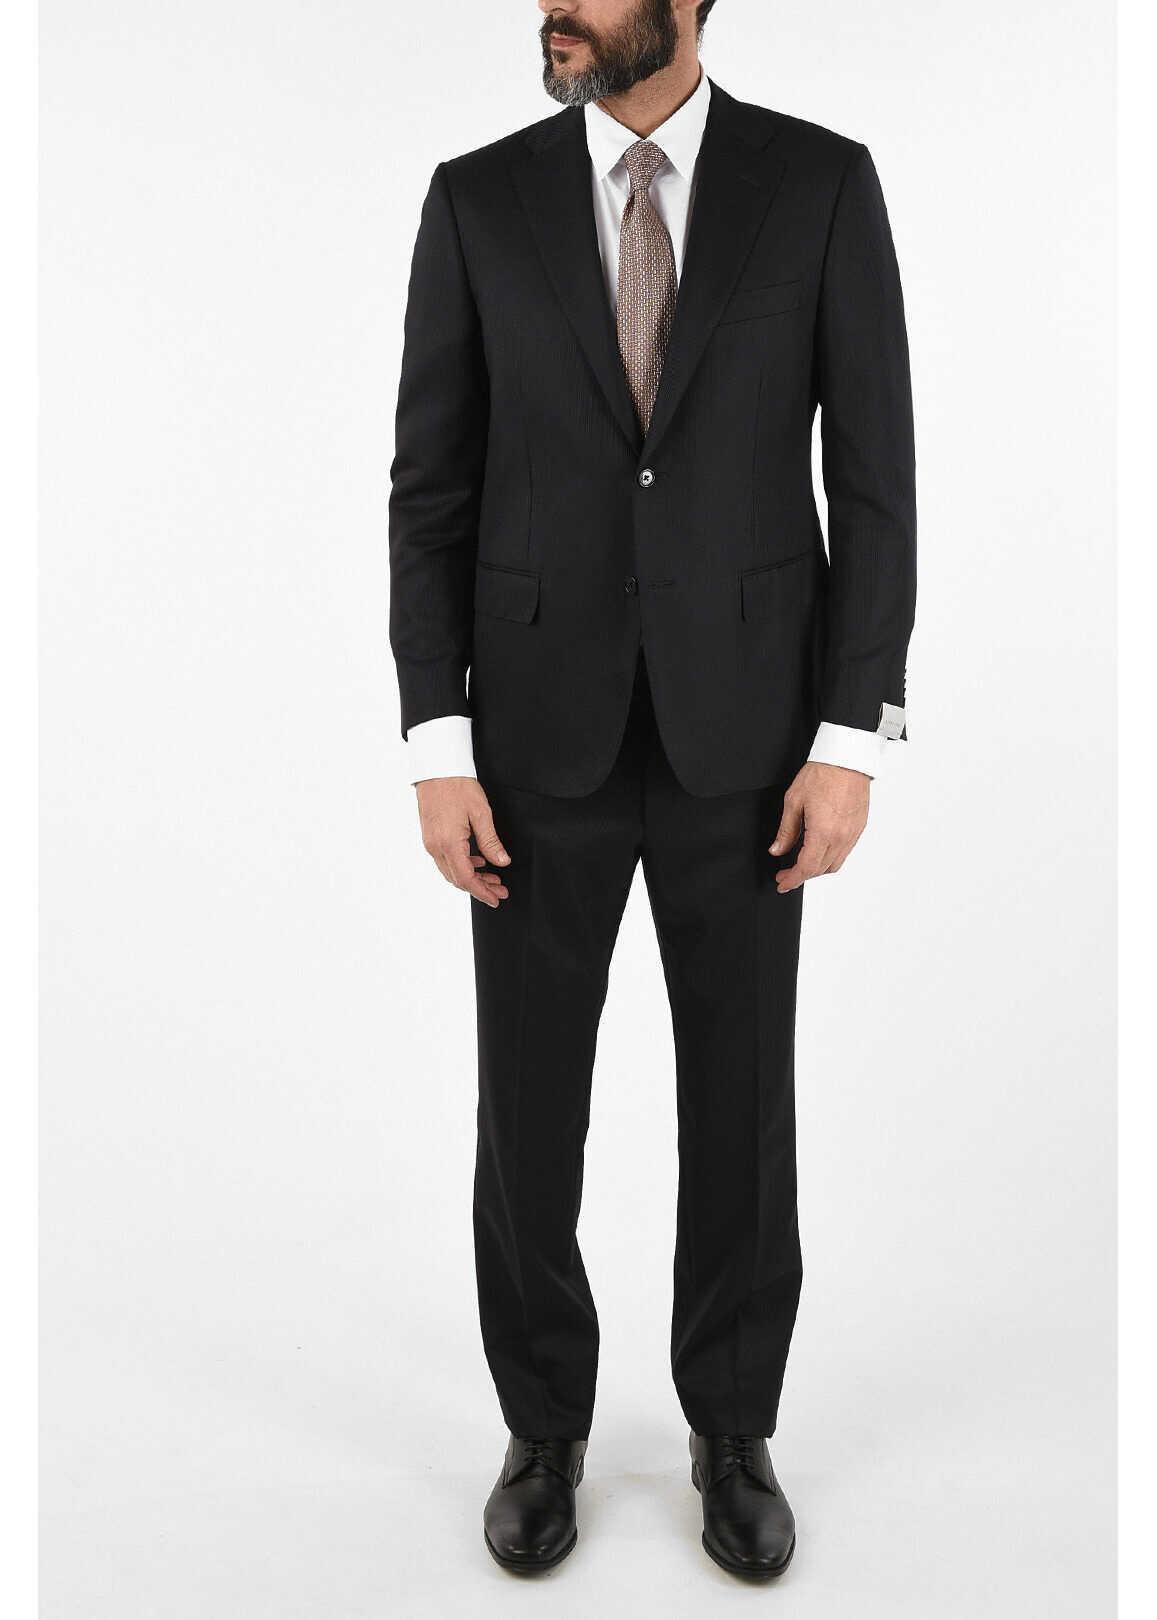 CORNELIANI side vent hairline striped drop 6R 2-button MANTUA suit MIDNIGHT BLUE imagine